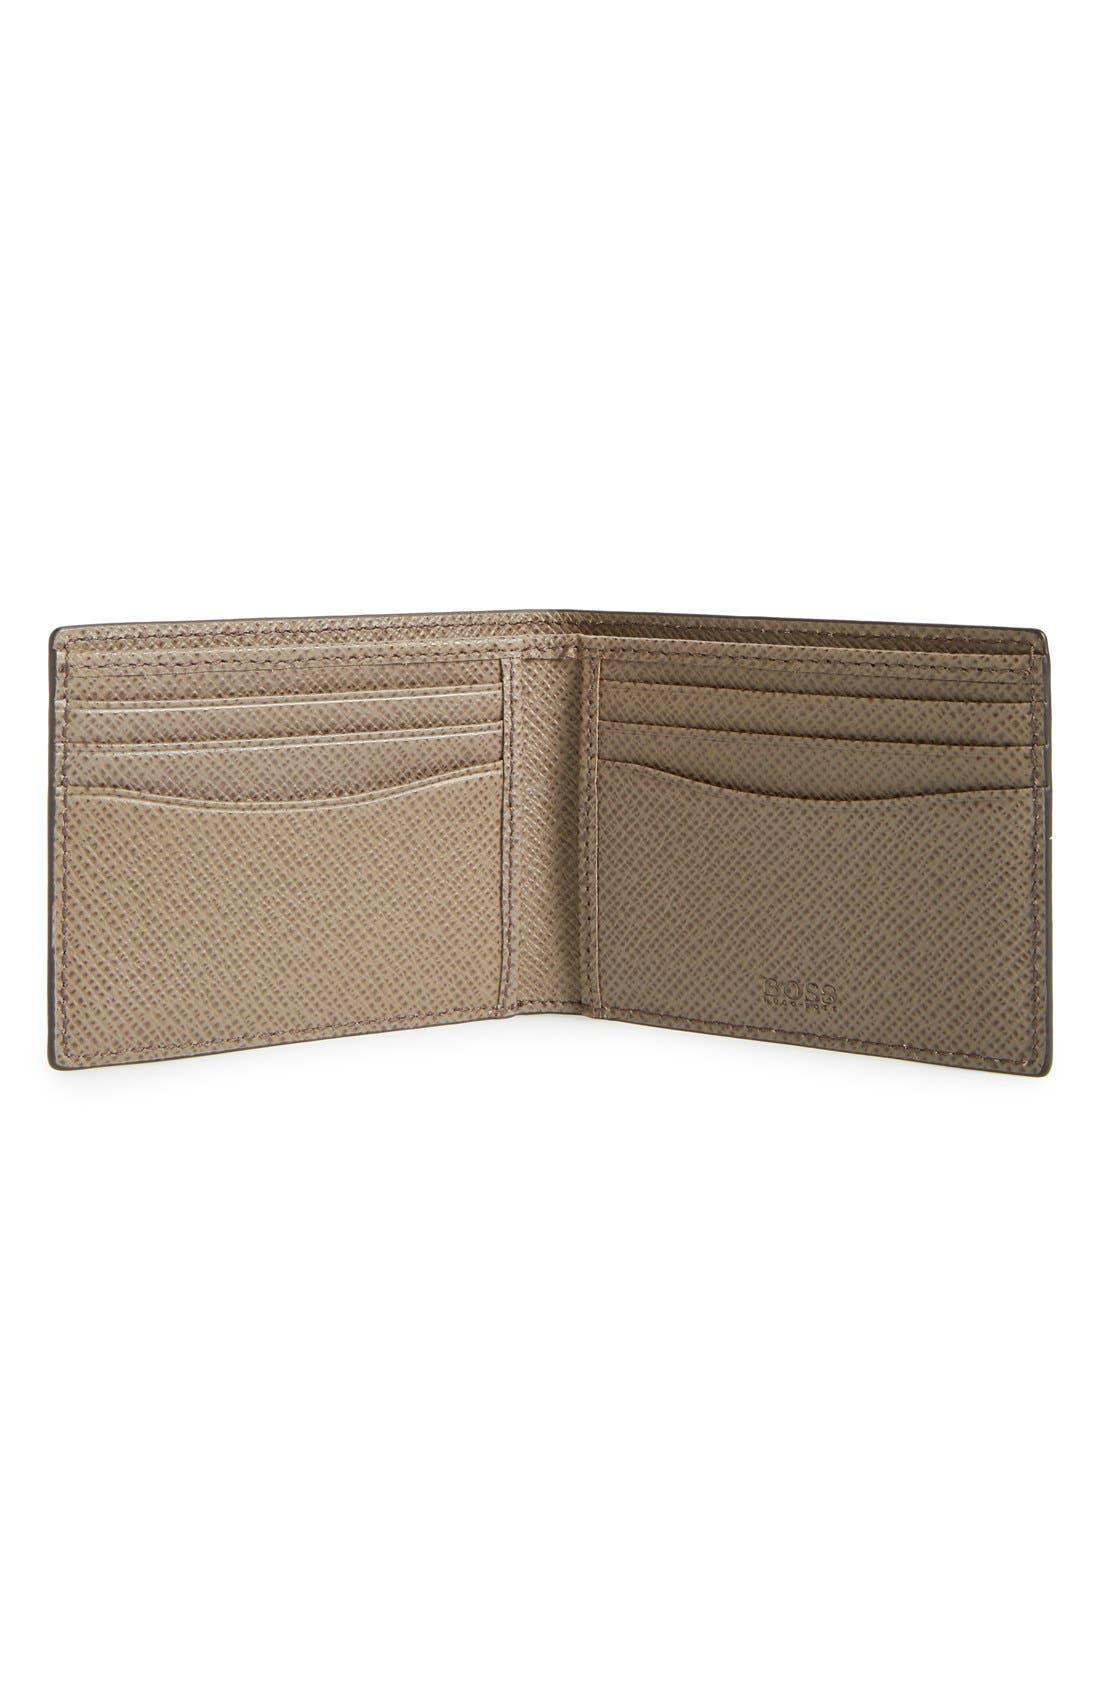 'Signature' Bifold Wallet,                             Alternate thumbnail 6, color,